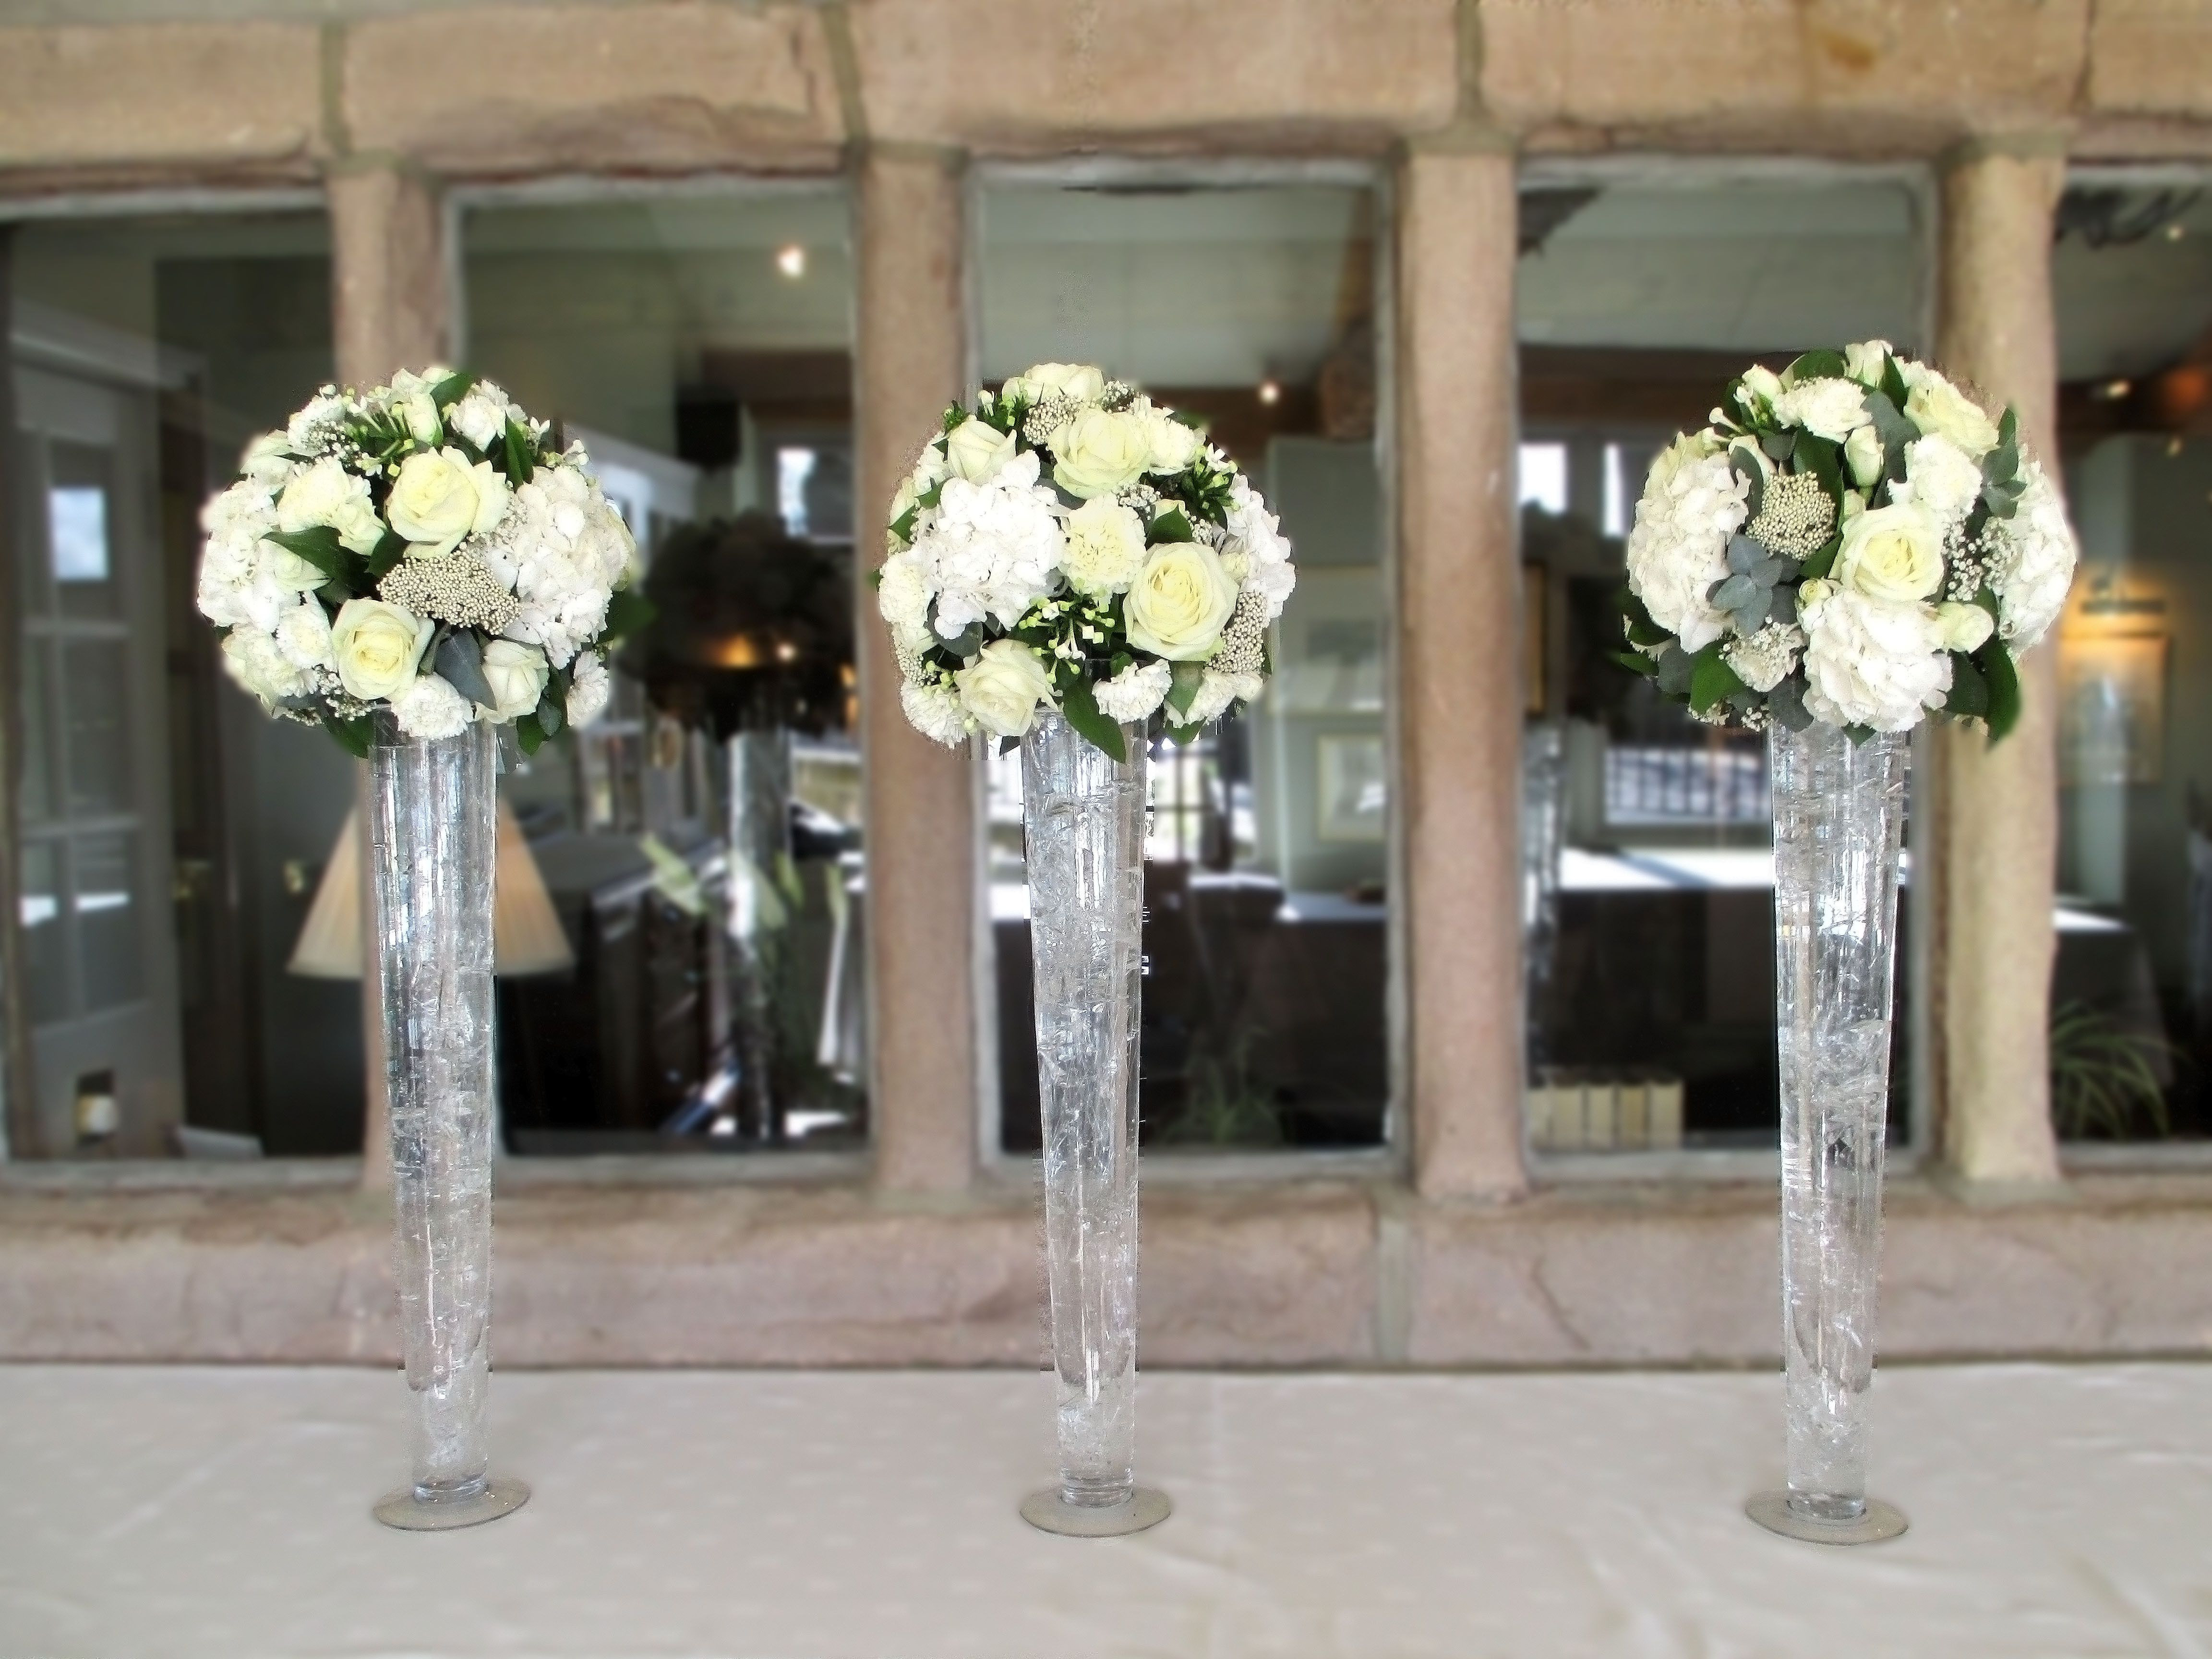 swarovski crystalline vase of macys crystal vase inspirational wholesale glass vases for intended for macys crystal vase inspirational wholesale glass vases for centerpieces for macys wedding favors